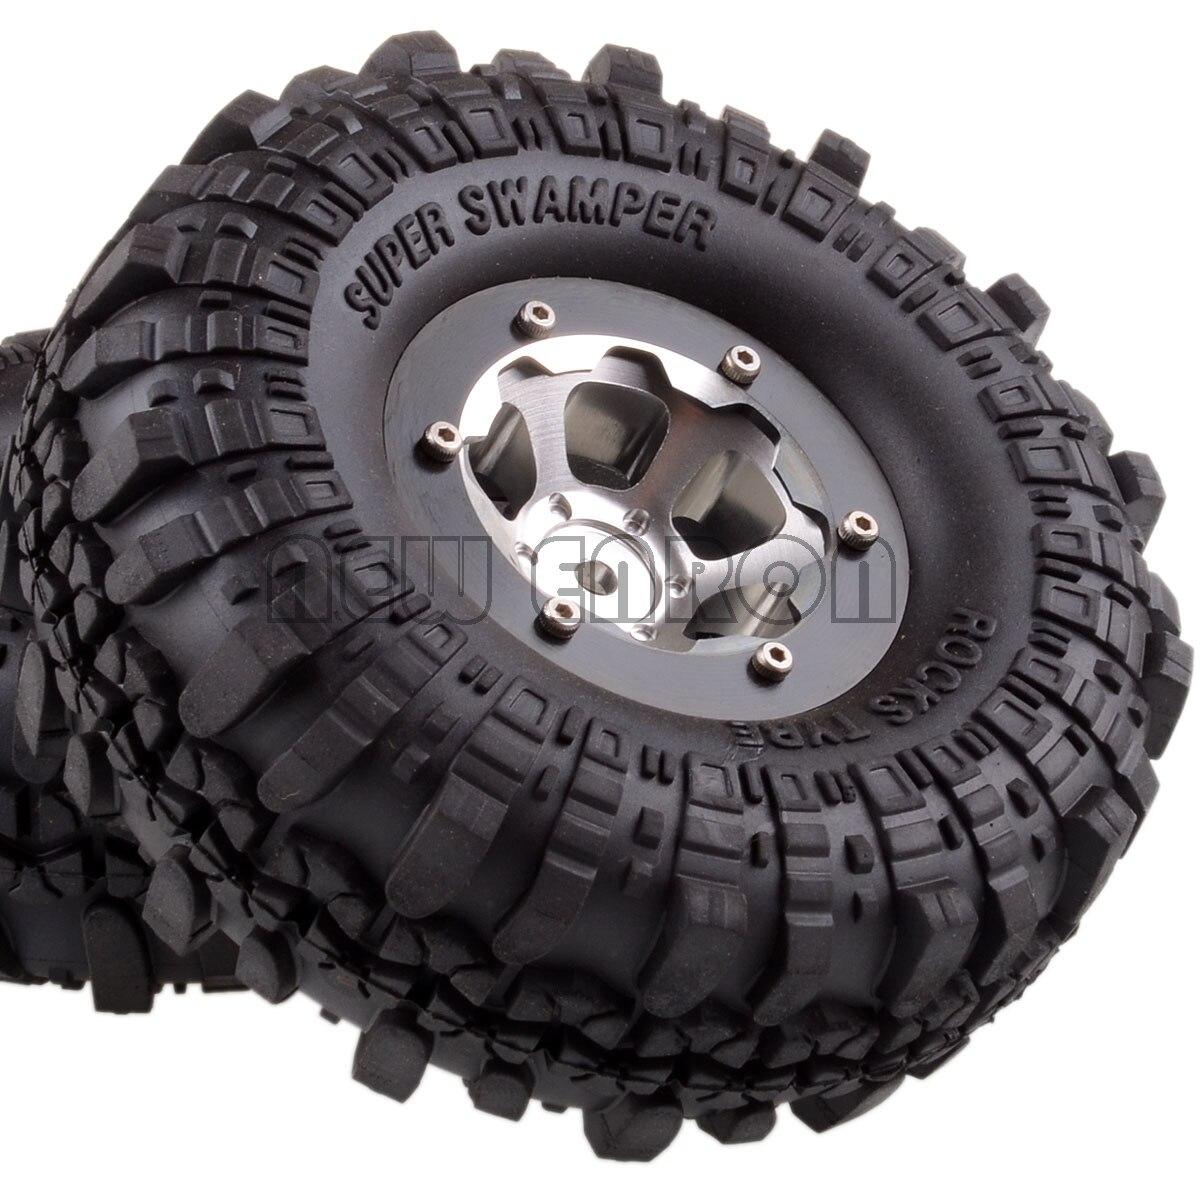 NEW ENRON 1P 1.9 Inch Aluminum Wheel Rim Hub 110MM Super Swamper Tyre Tires For RC 1:10 Rock Crawler D90 D110 MST Jimny TRX4 TF2